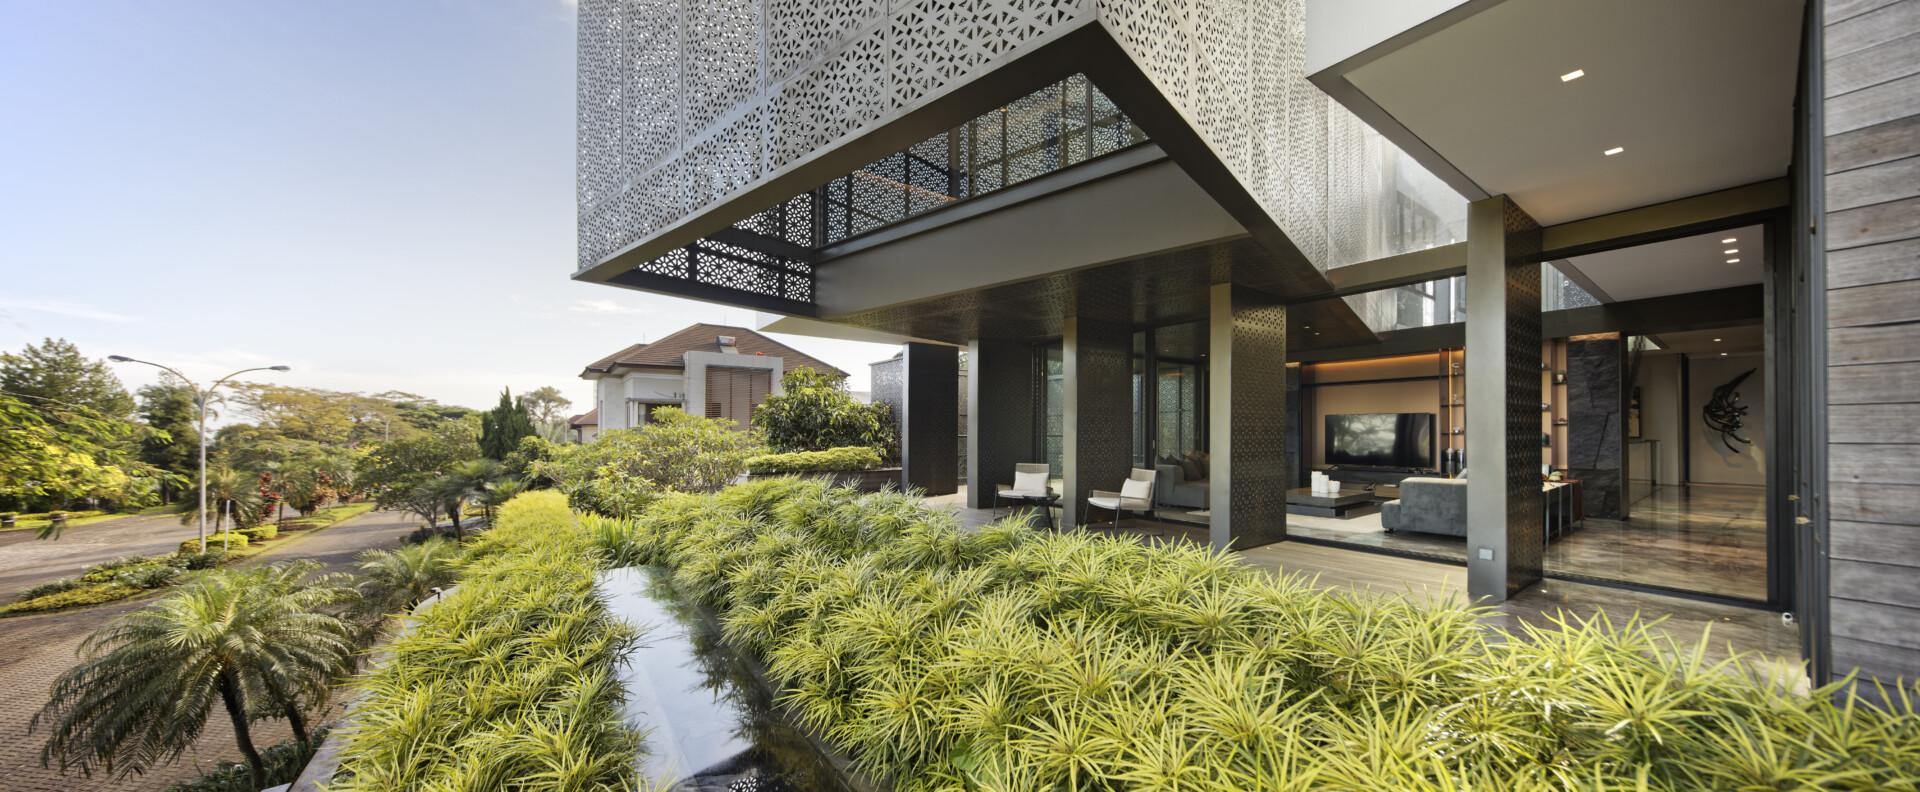 GOLFN HOUSE - Image 10